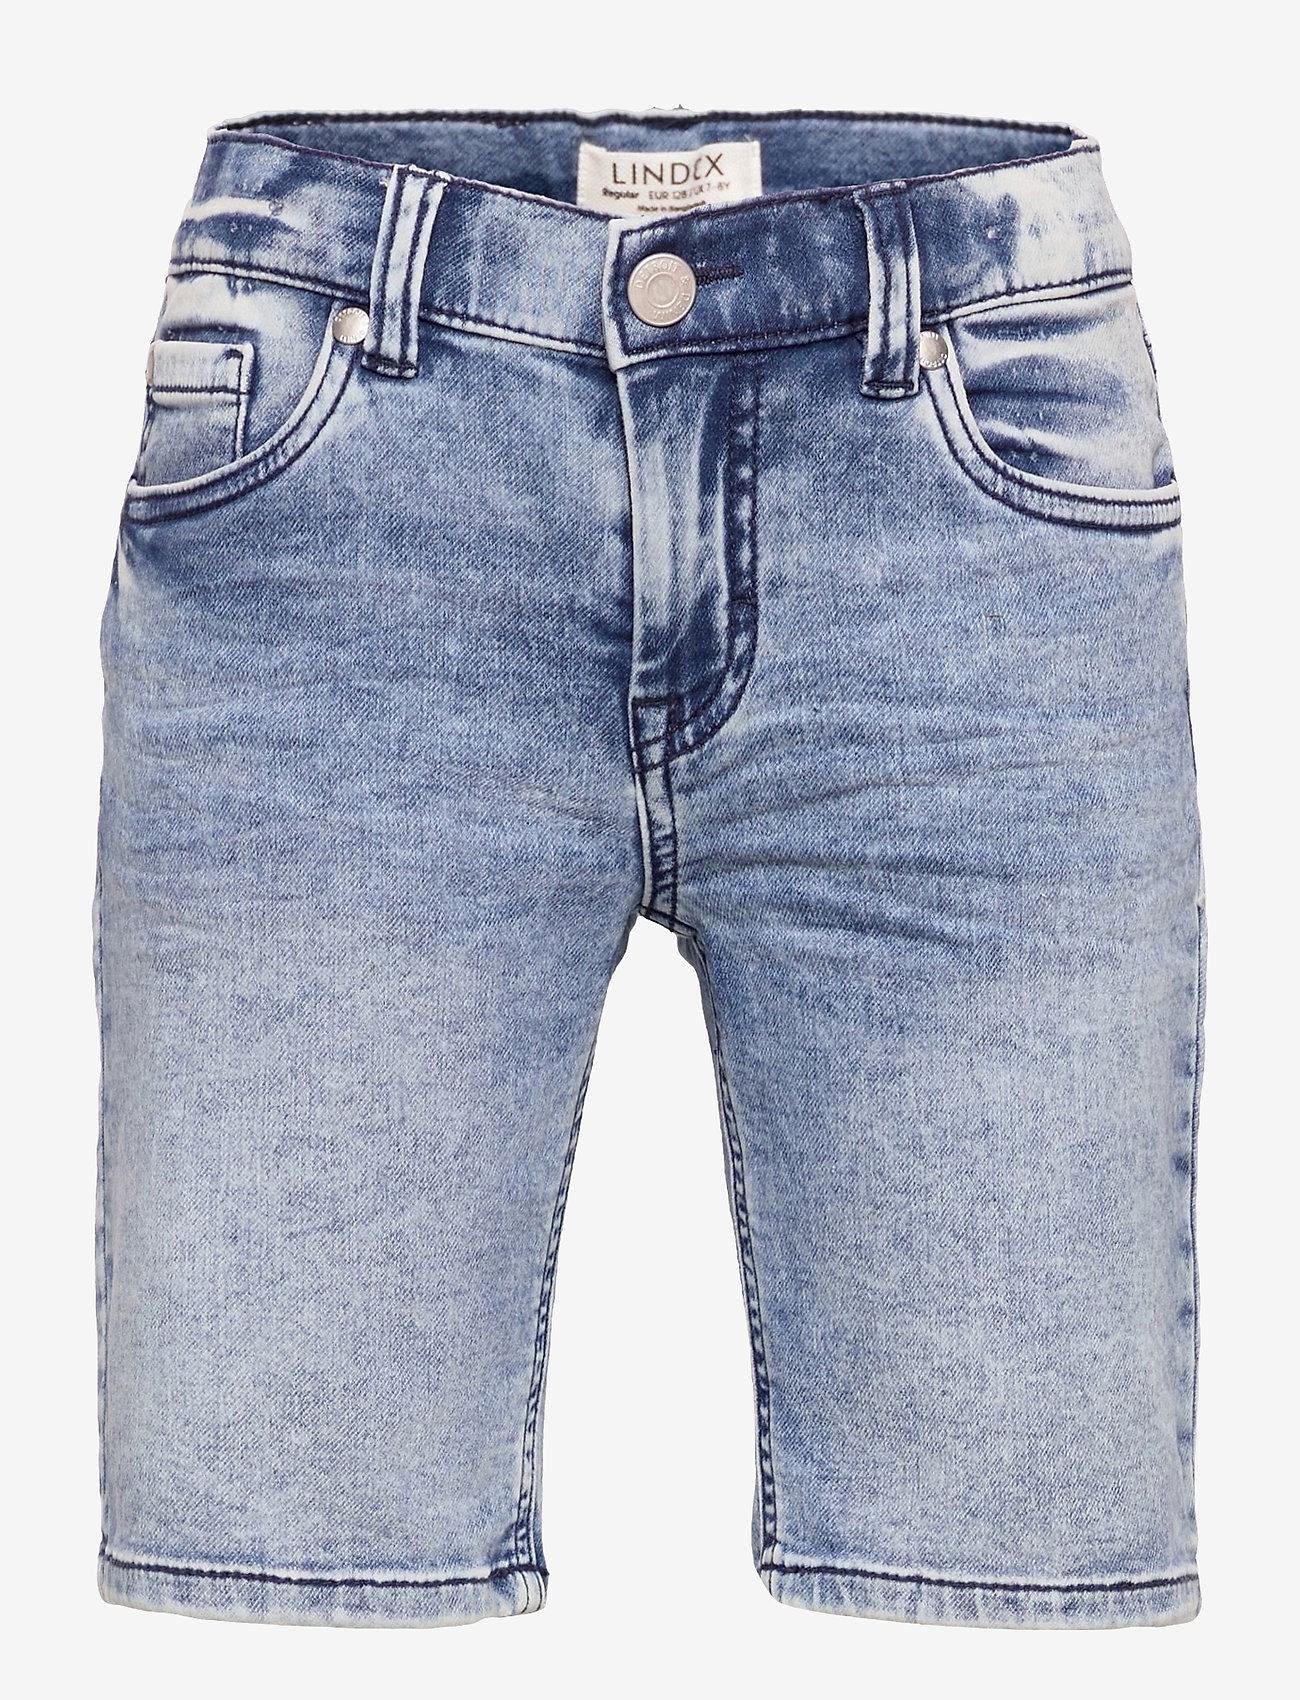 Lindex - Shorts denim Jerry jersey regu - shorts - blue - 0